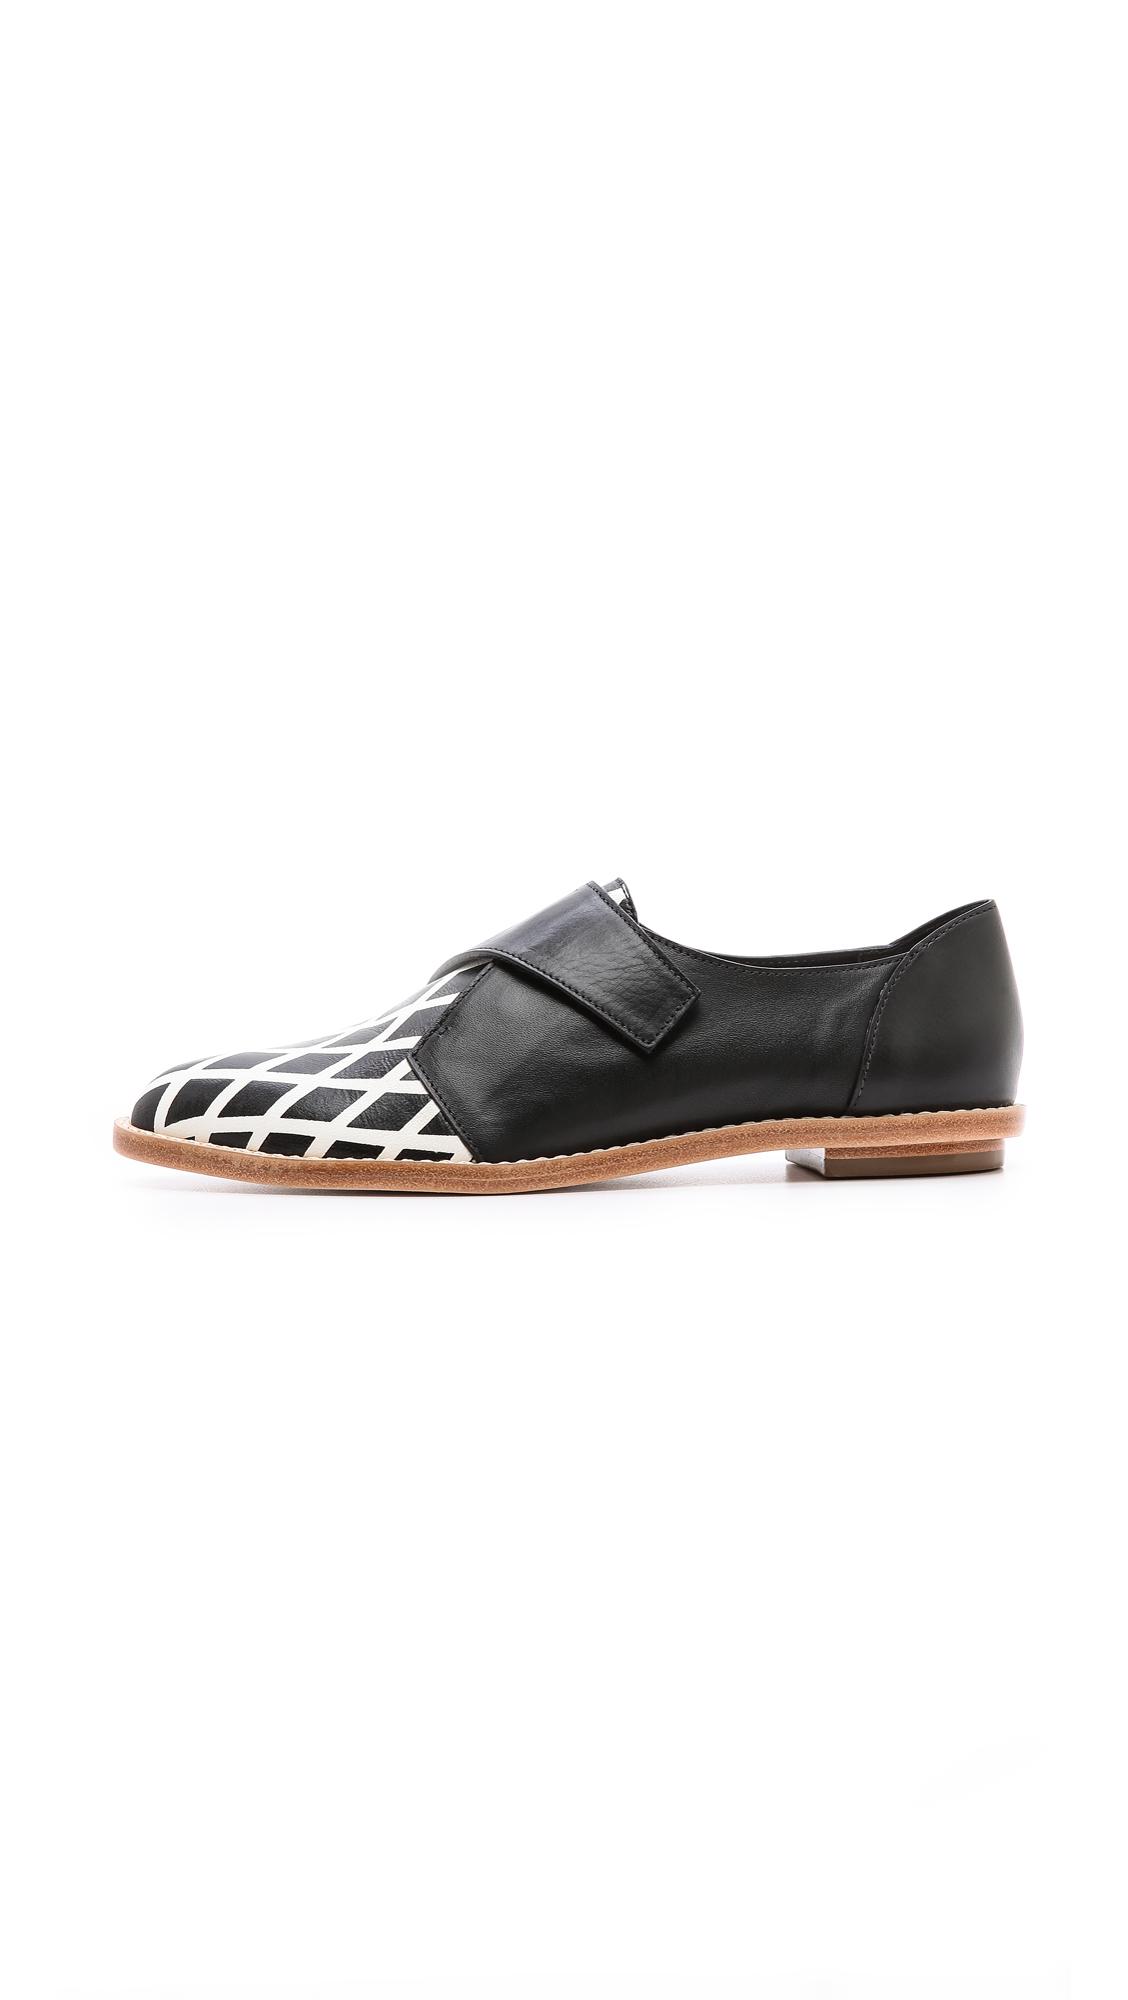 Black Monk Strap Women S Shoes Canada